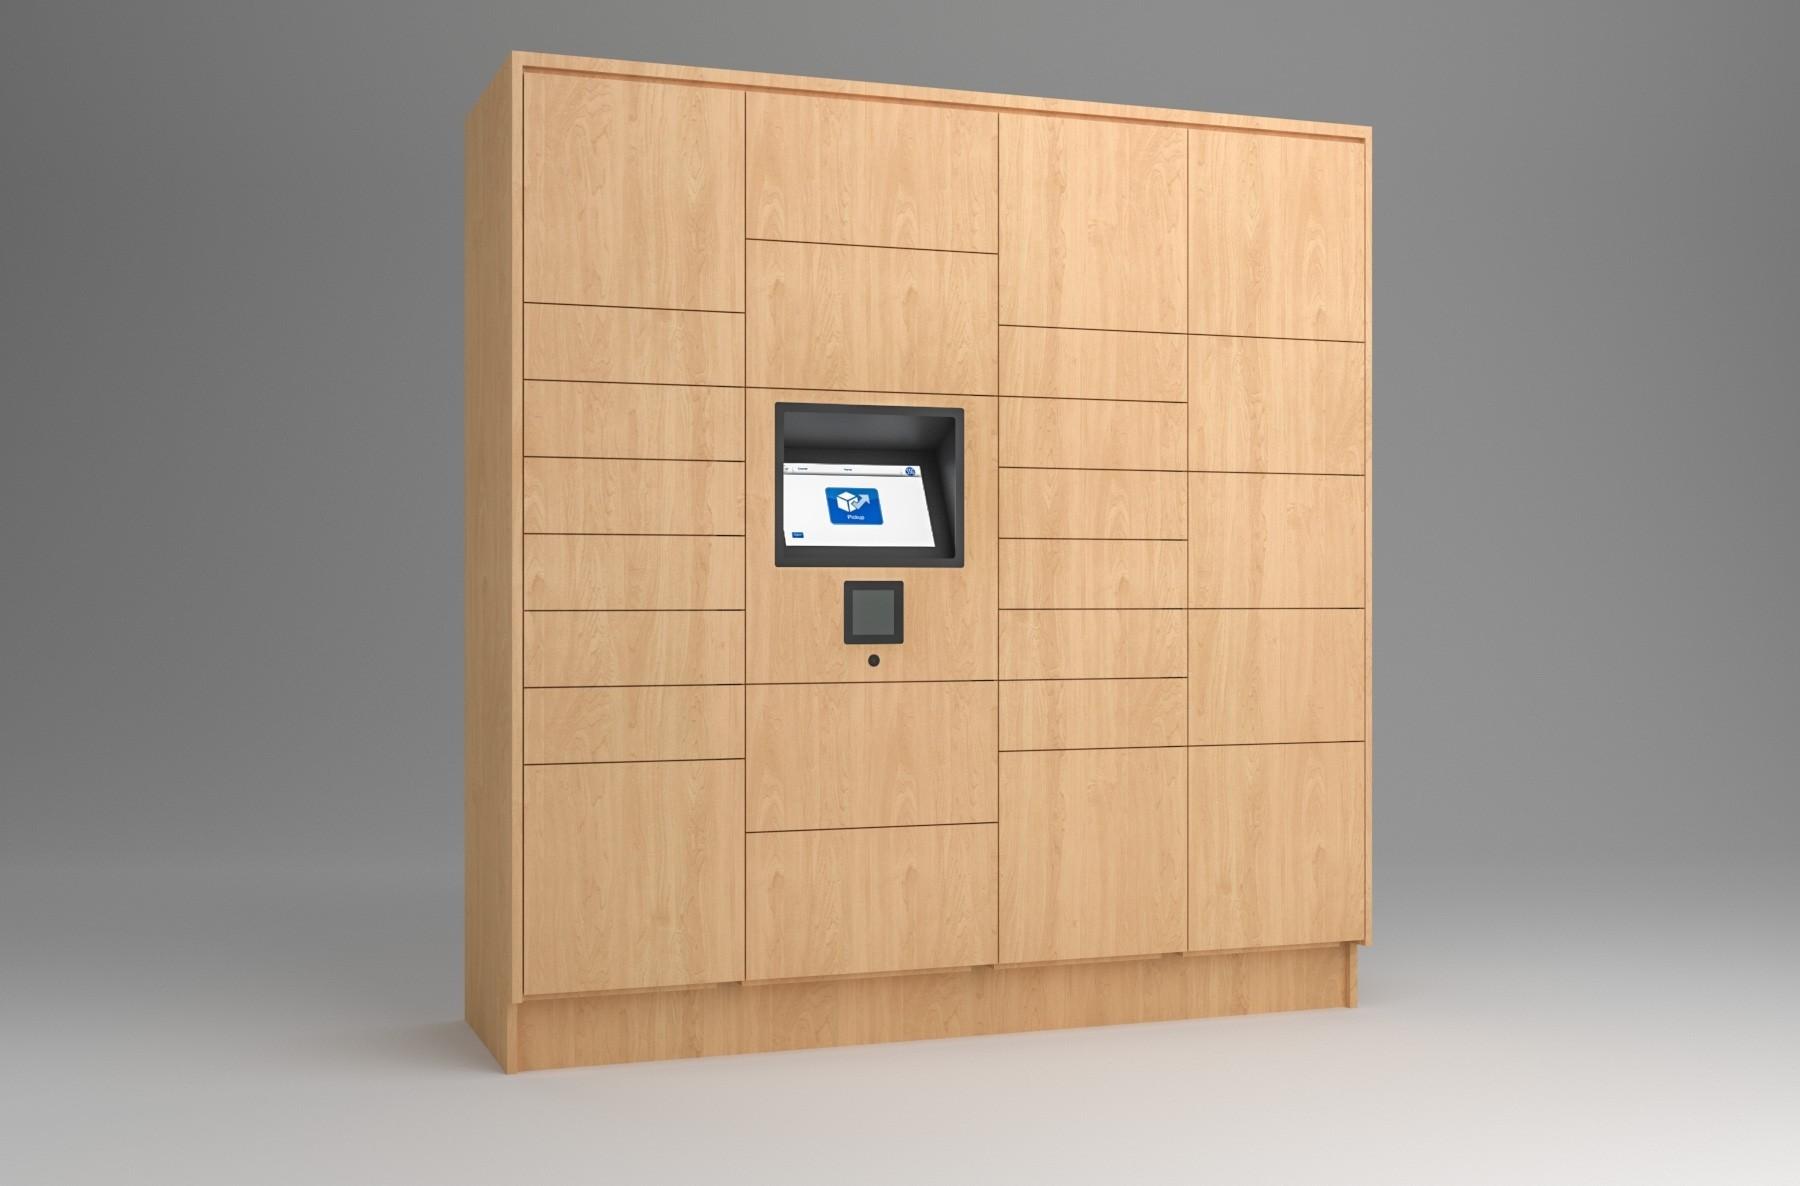 25 Total Openings Laminate Smart Locker